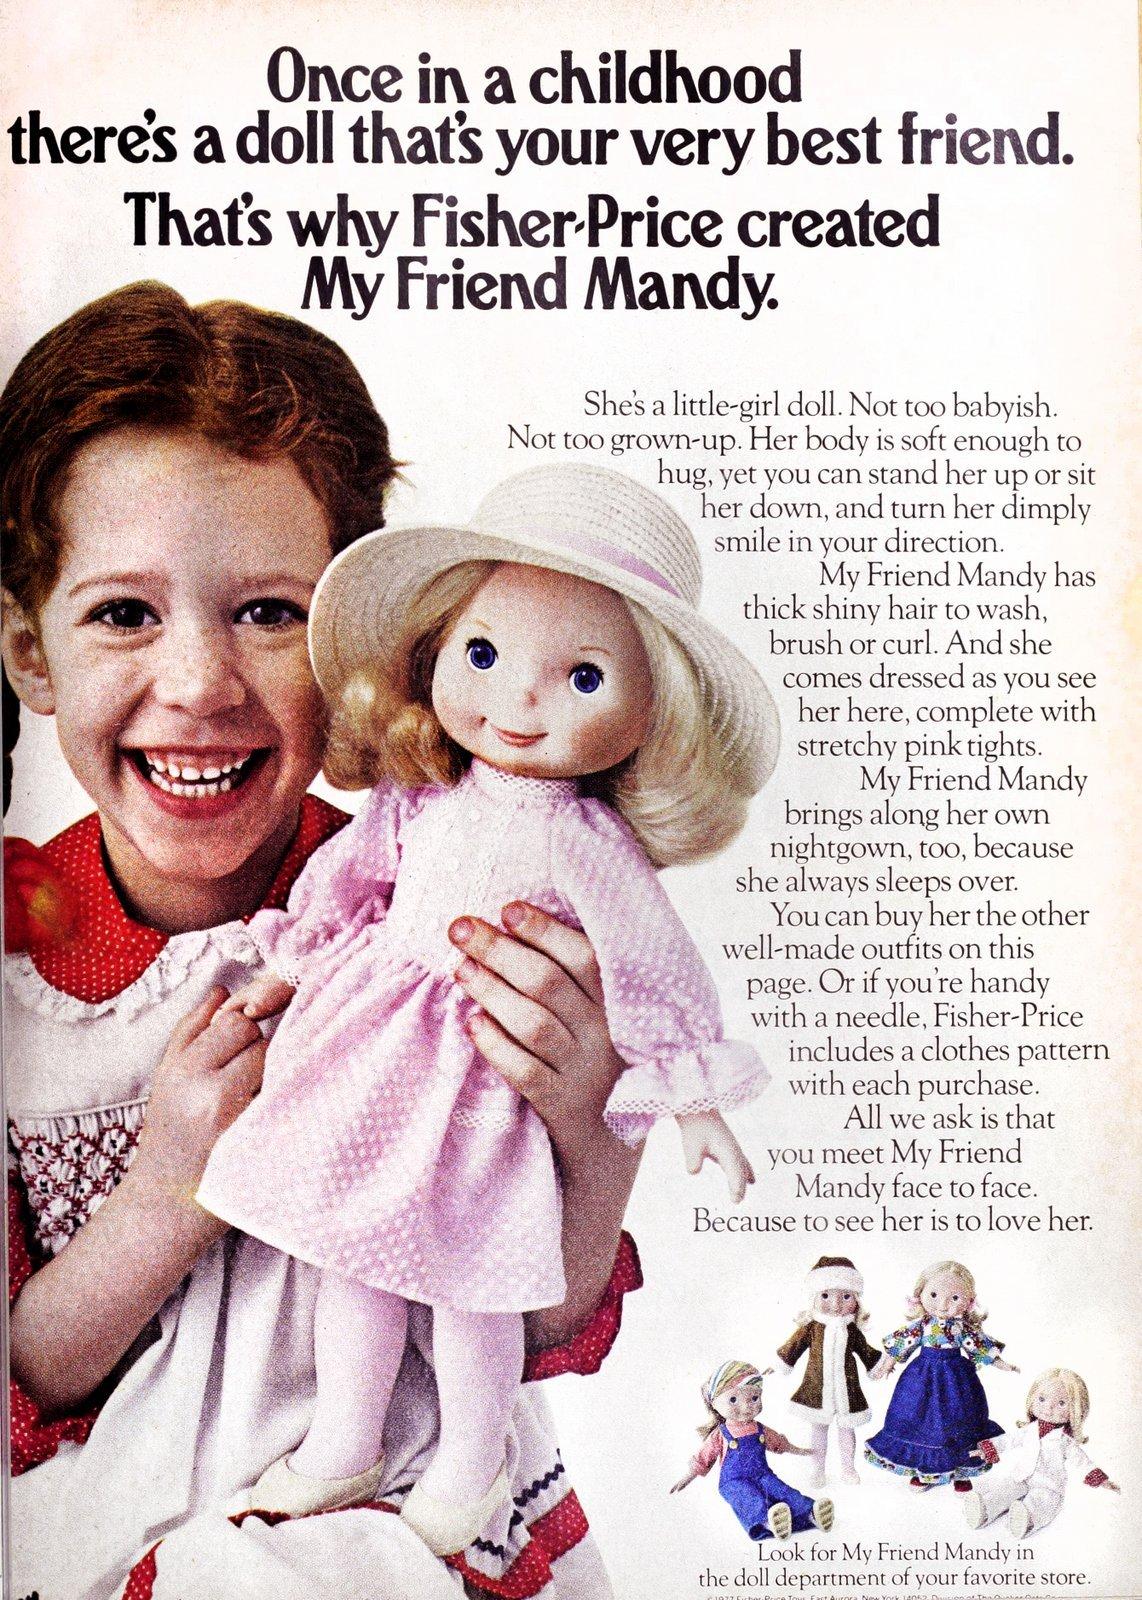 Vintage Fisher-Price My Friend Mandy doll (1977)